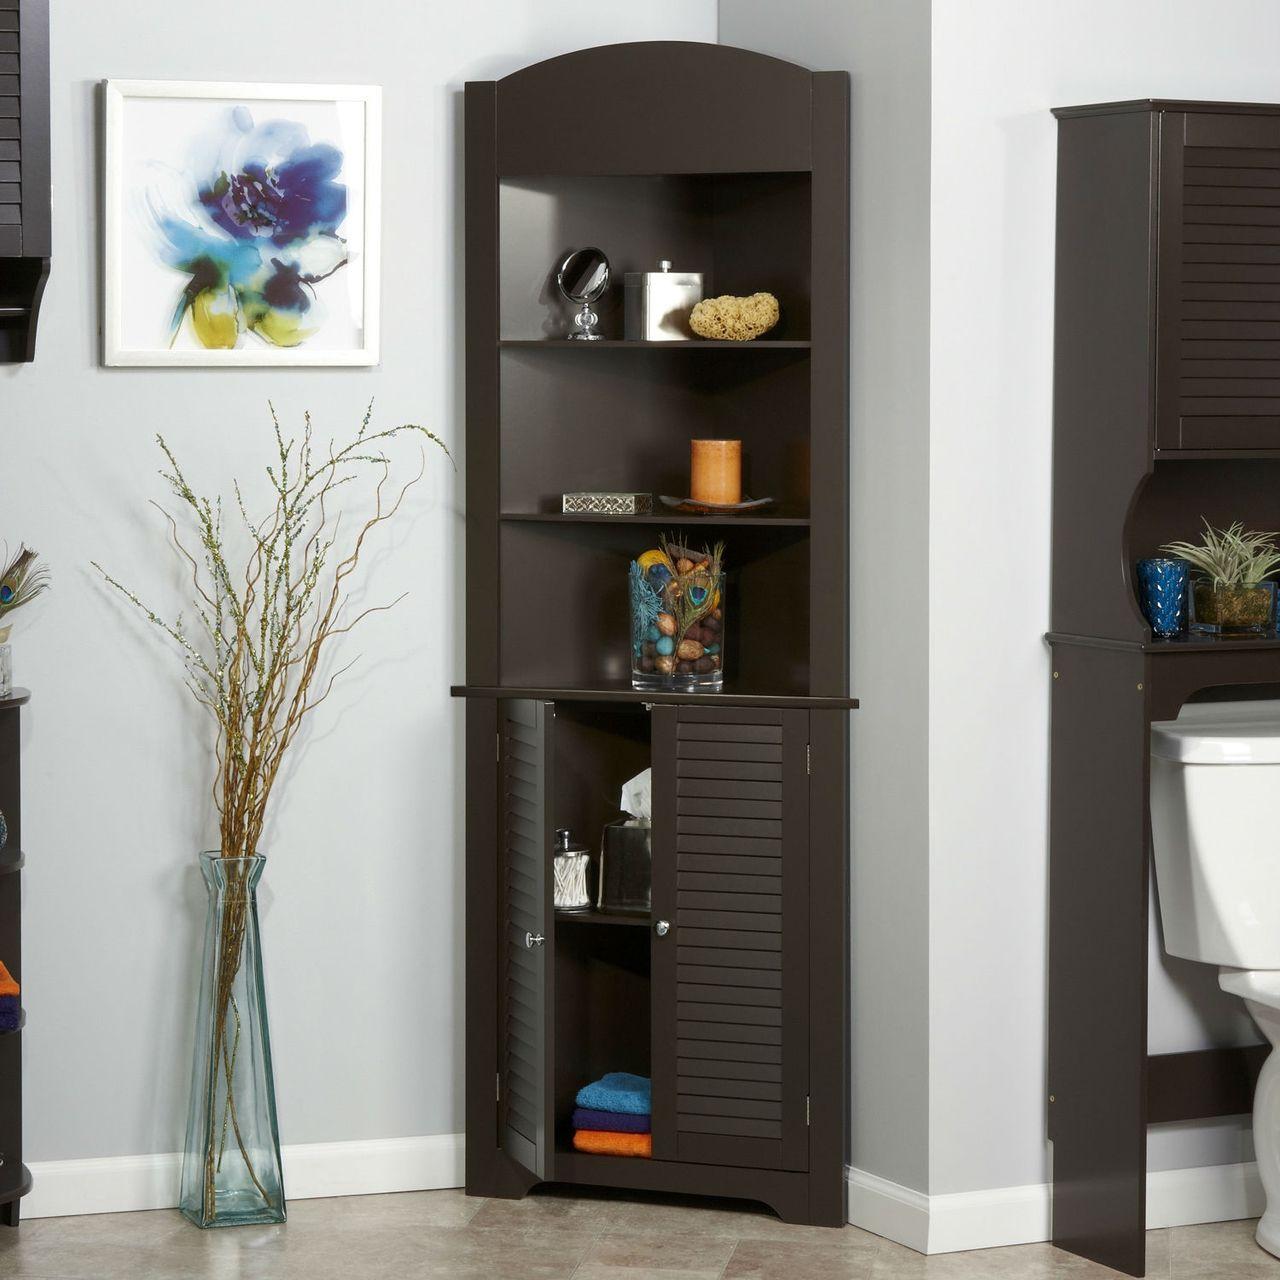 Espresso Bathroom Linen Tower Corner Towel Storage Cabinet 3 Shelves Corner Storage Cabinet Bathroom Linen Tower Corner Storage